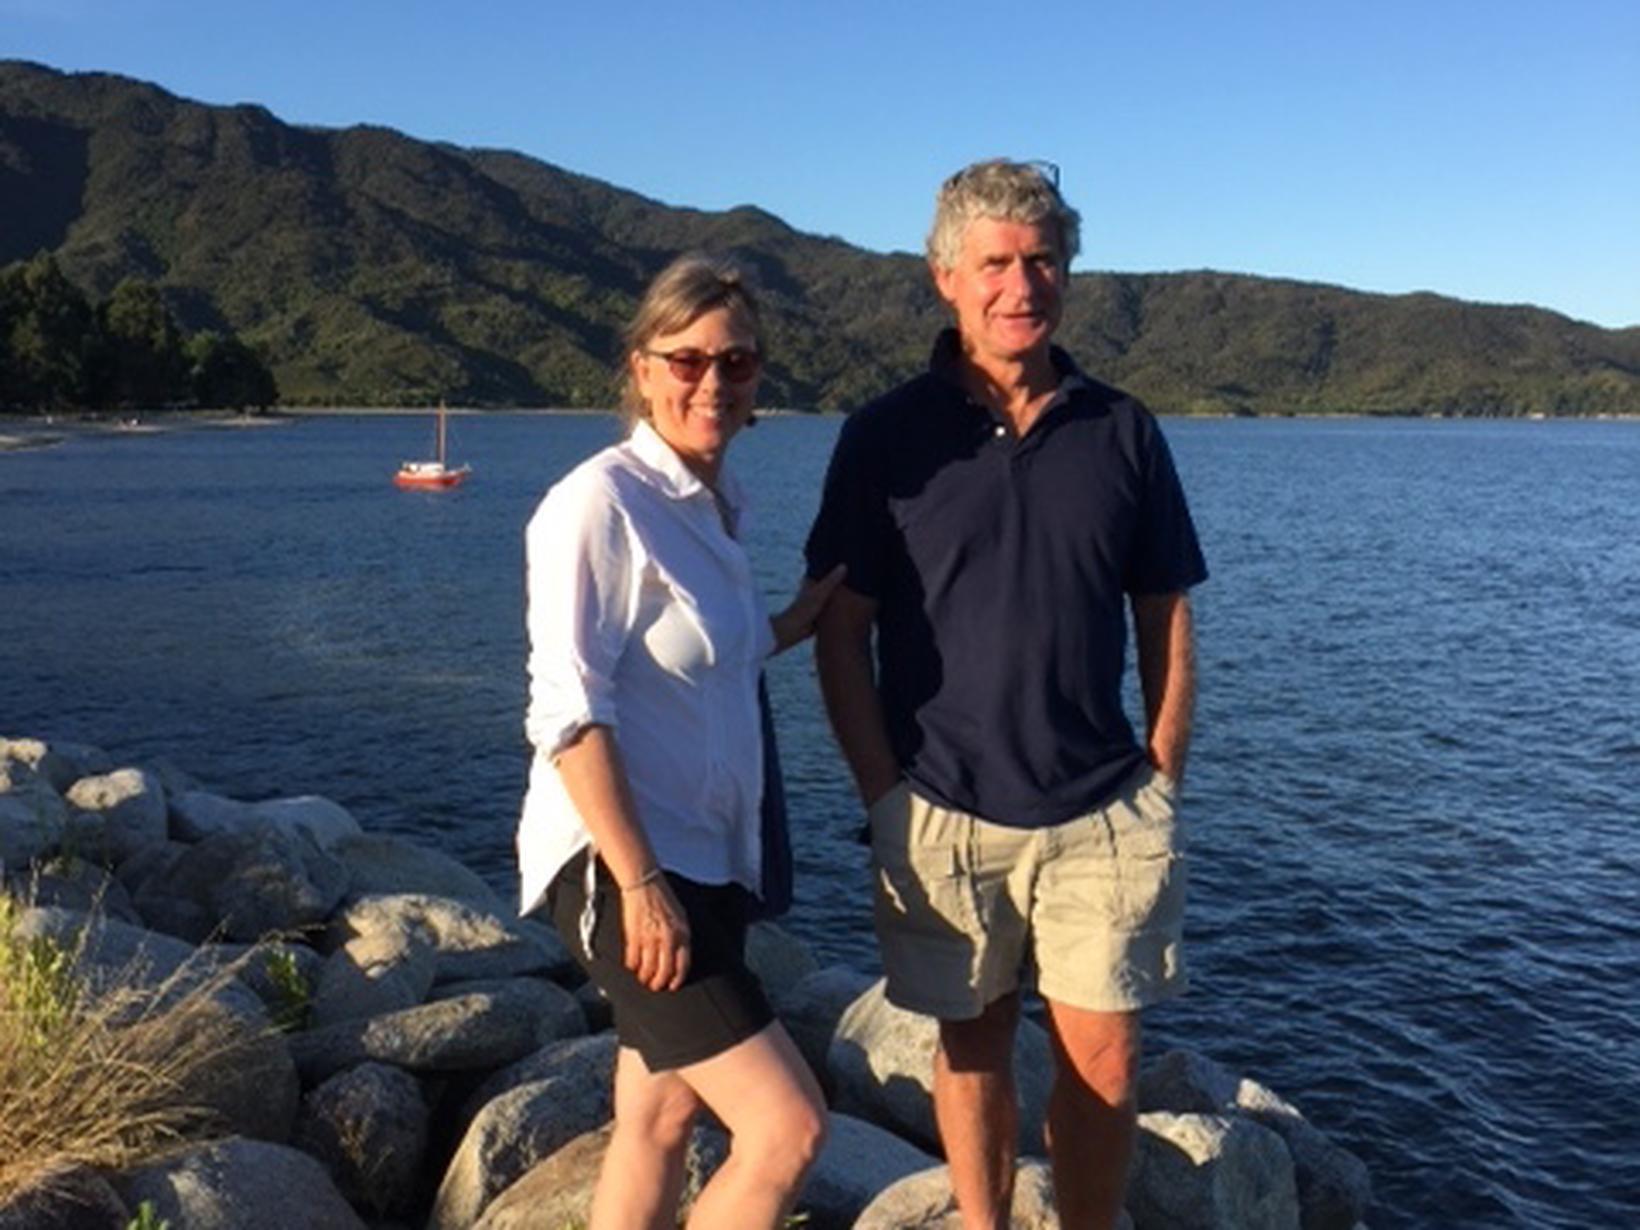 Peter & Diane from Winton, New Zealand